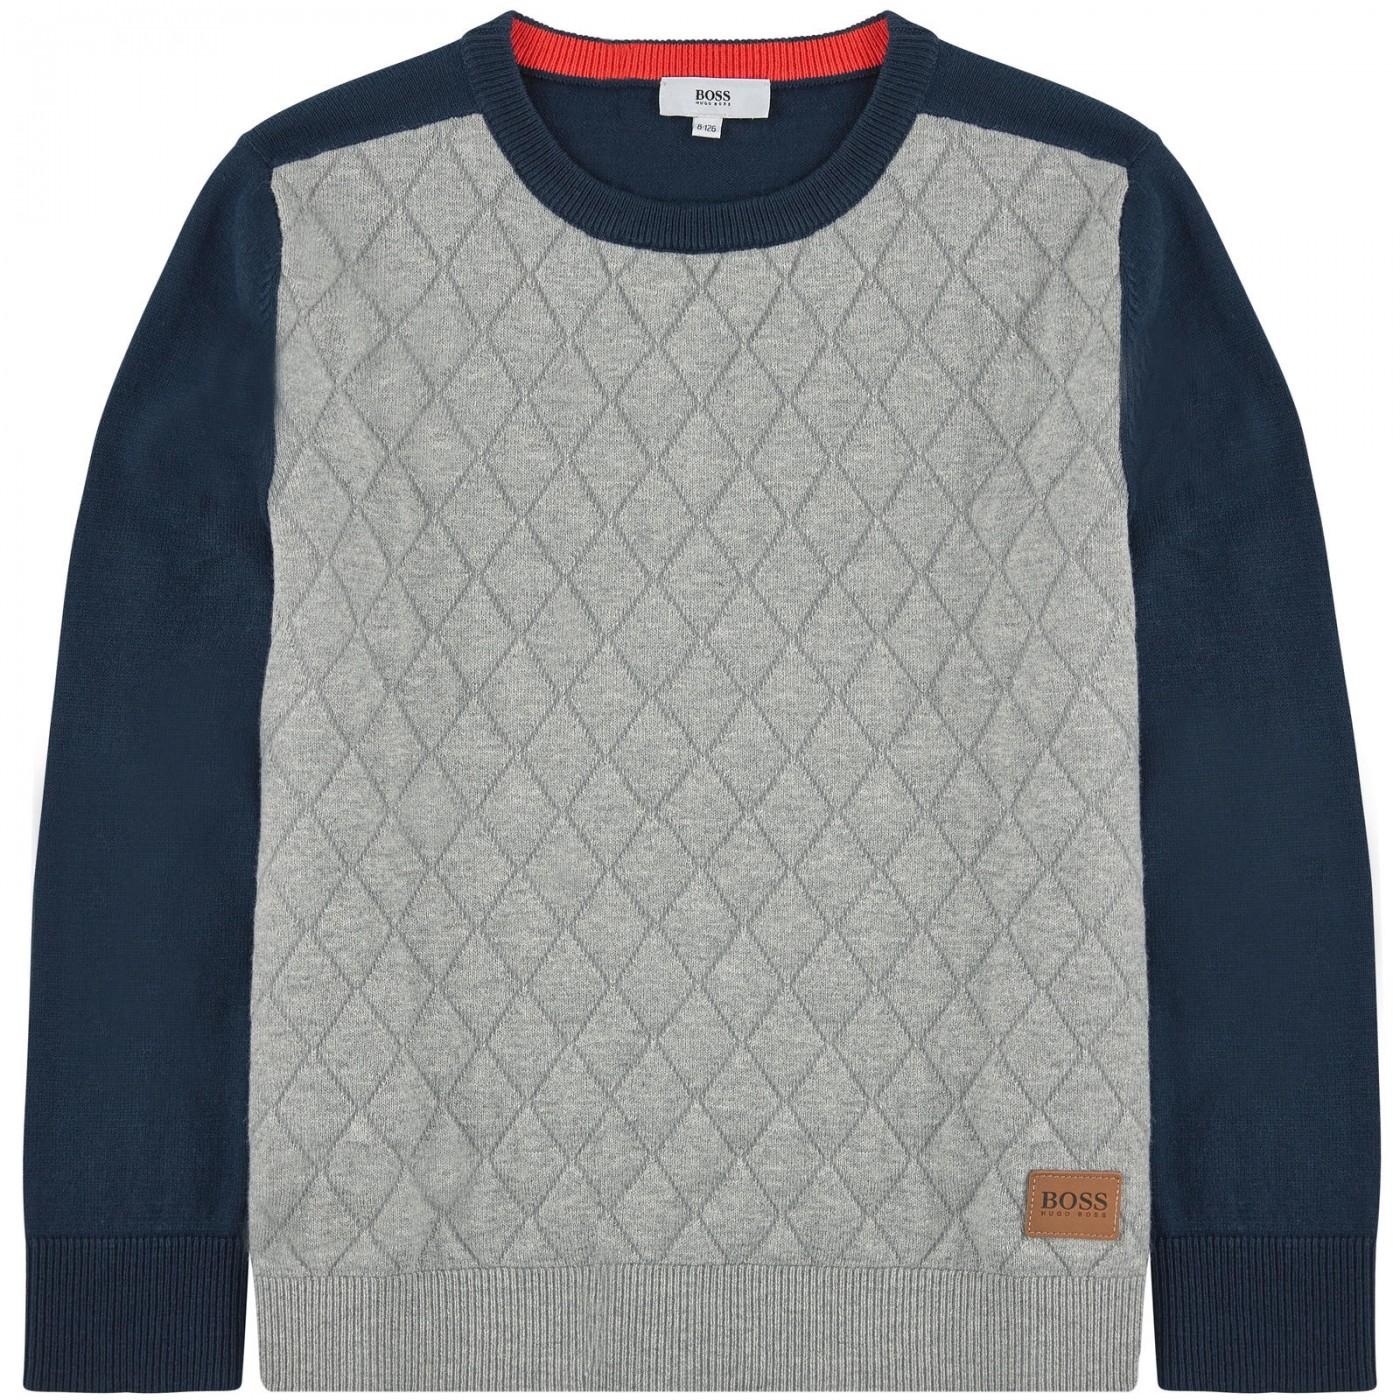 Пуловер Hugo Boss J25885-849